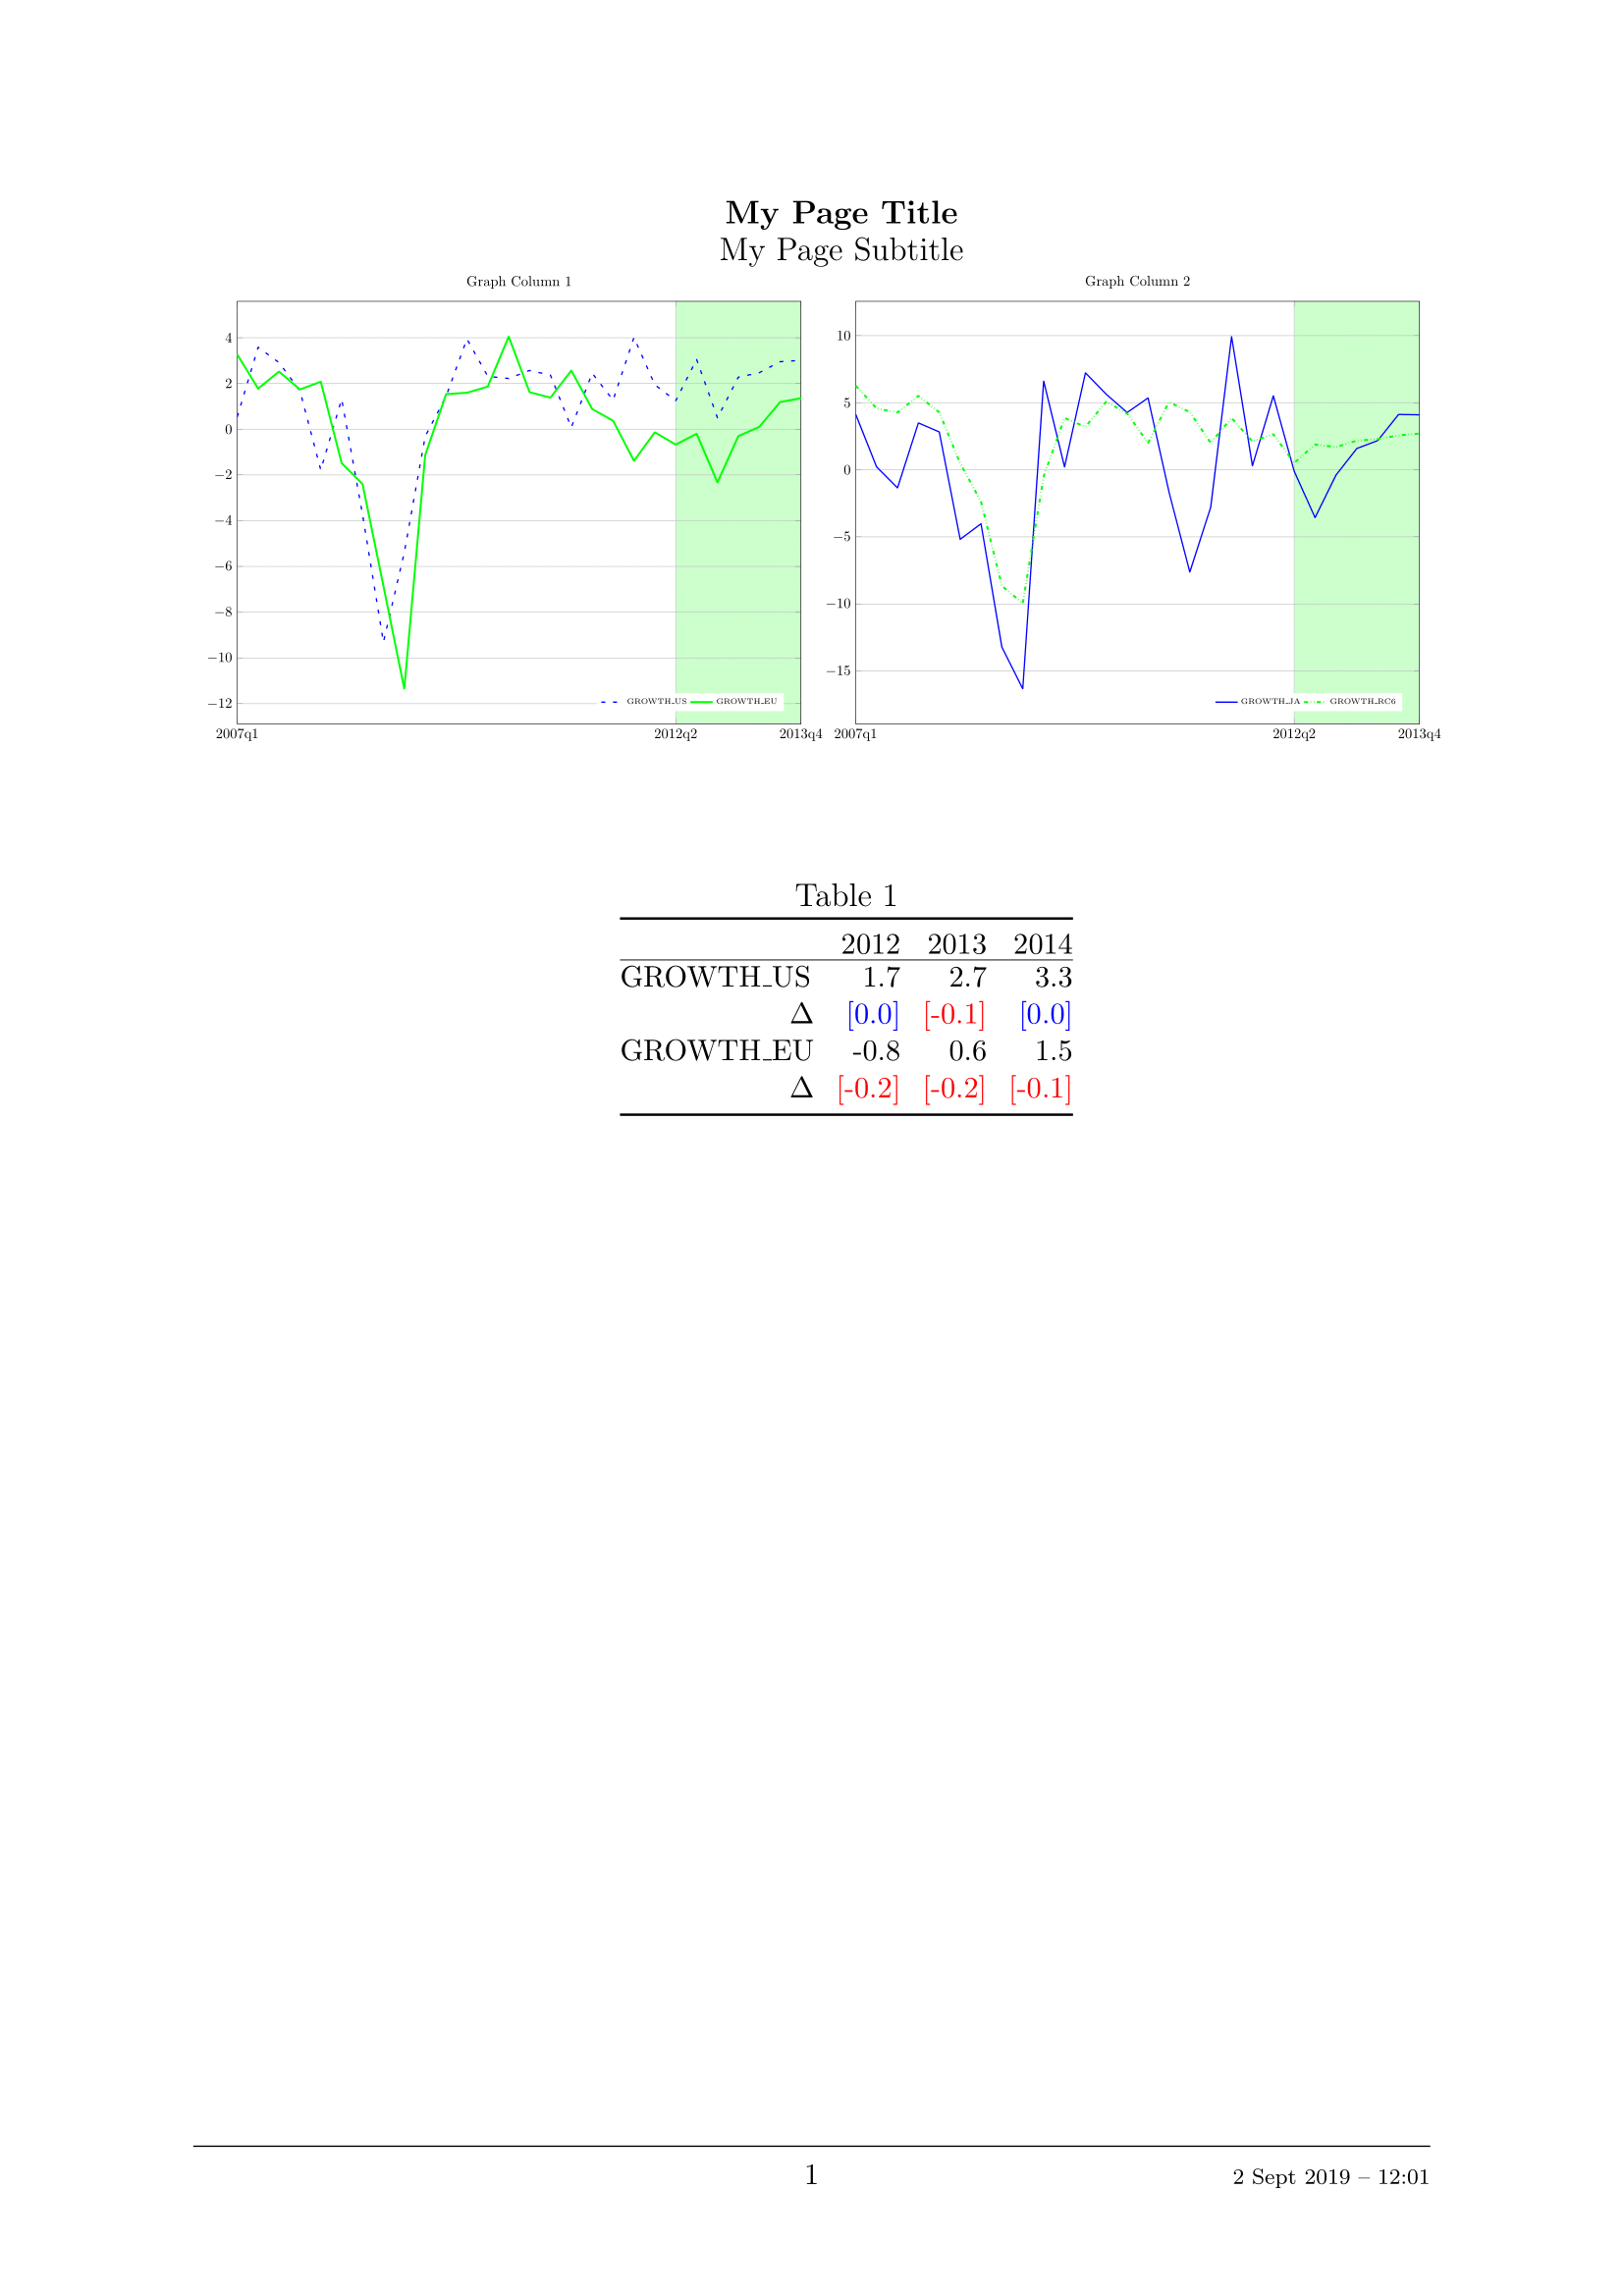 doc/manual/source/_static/report.png